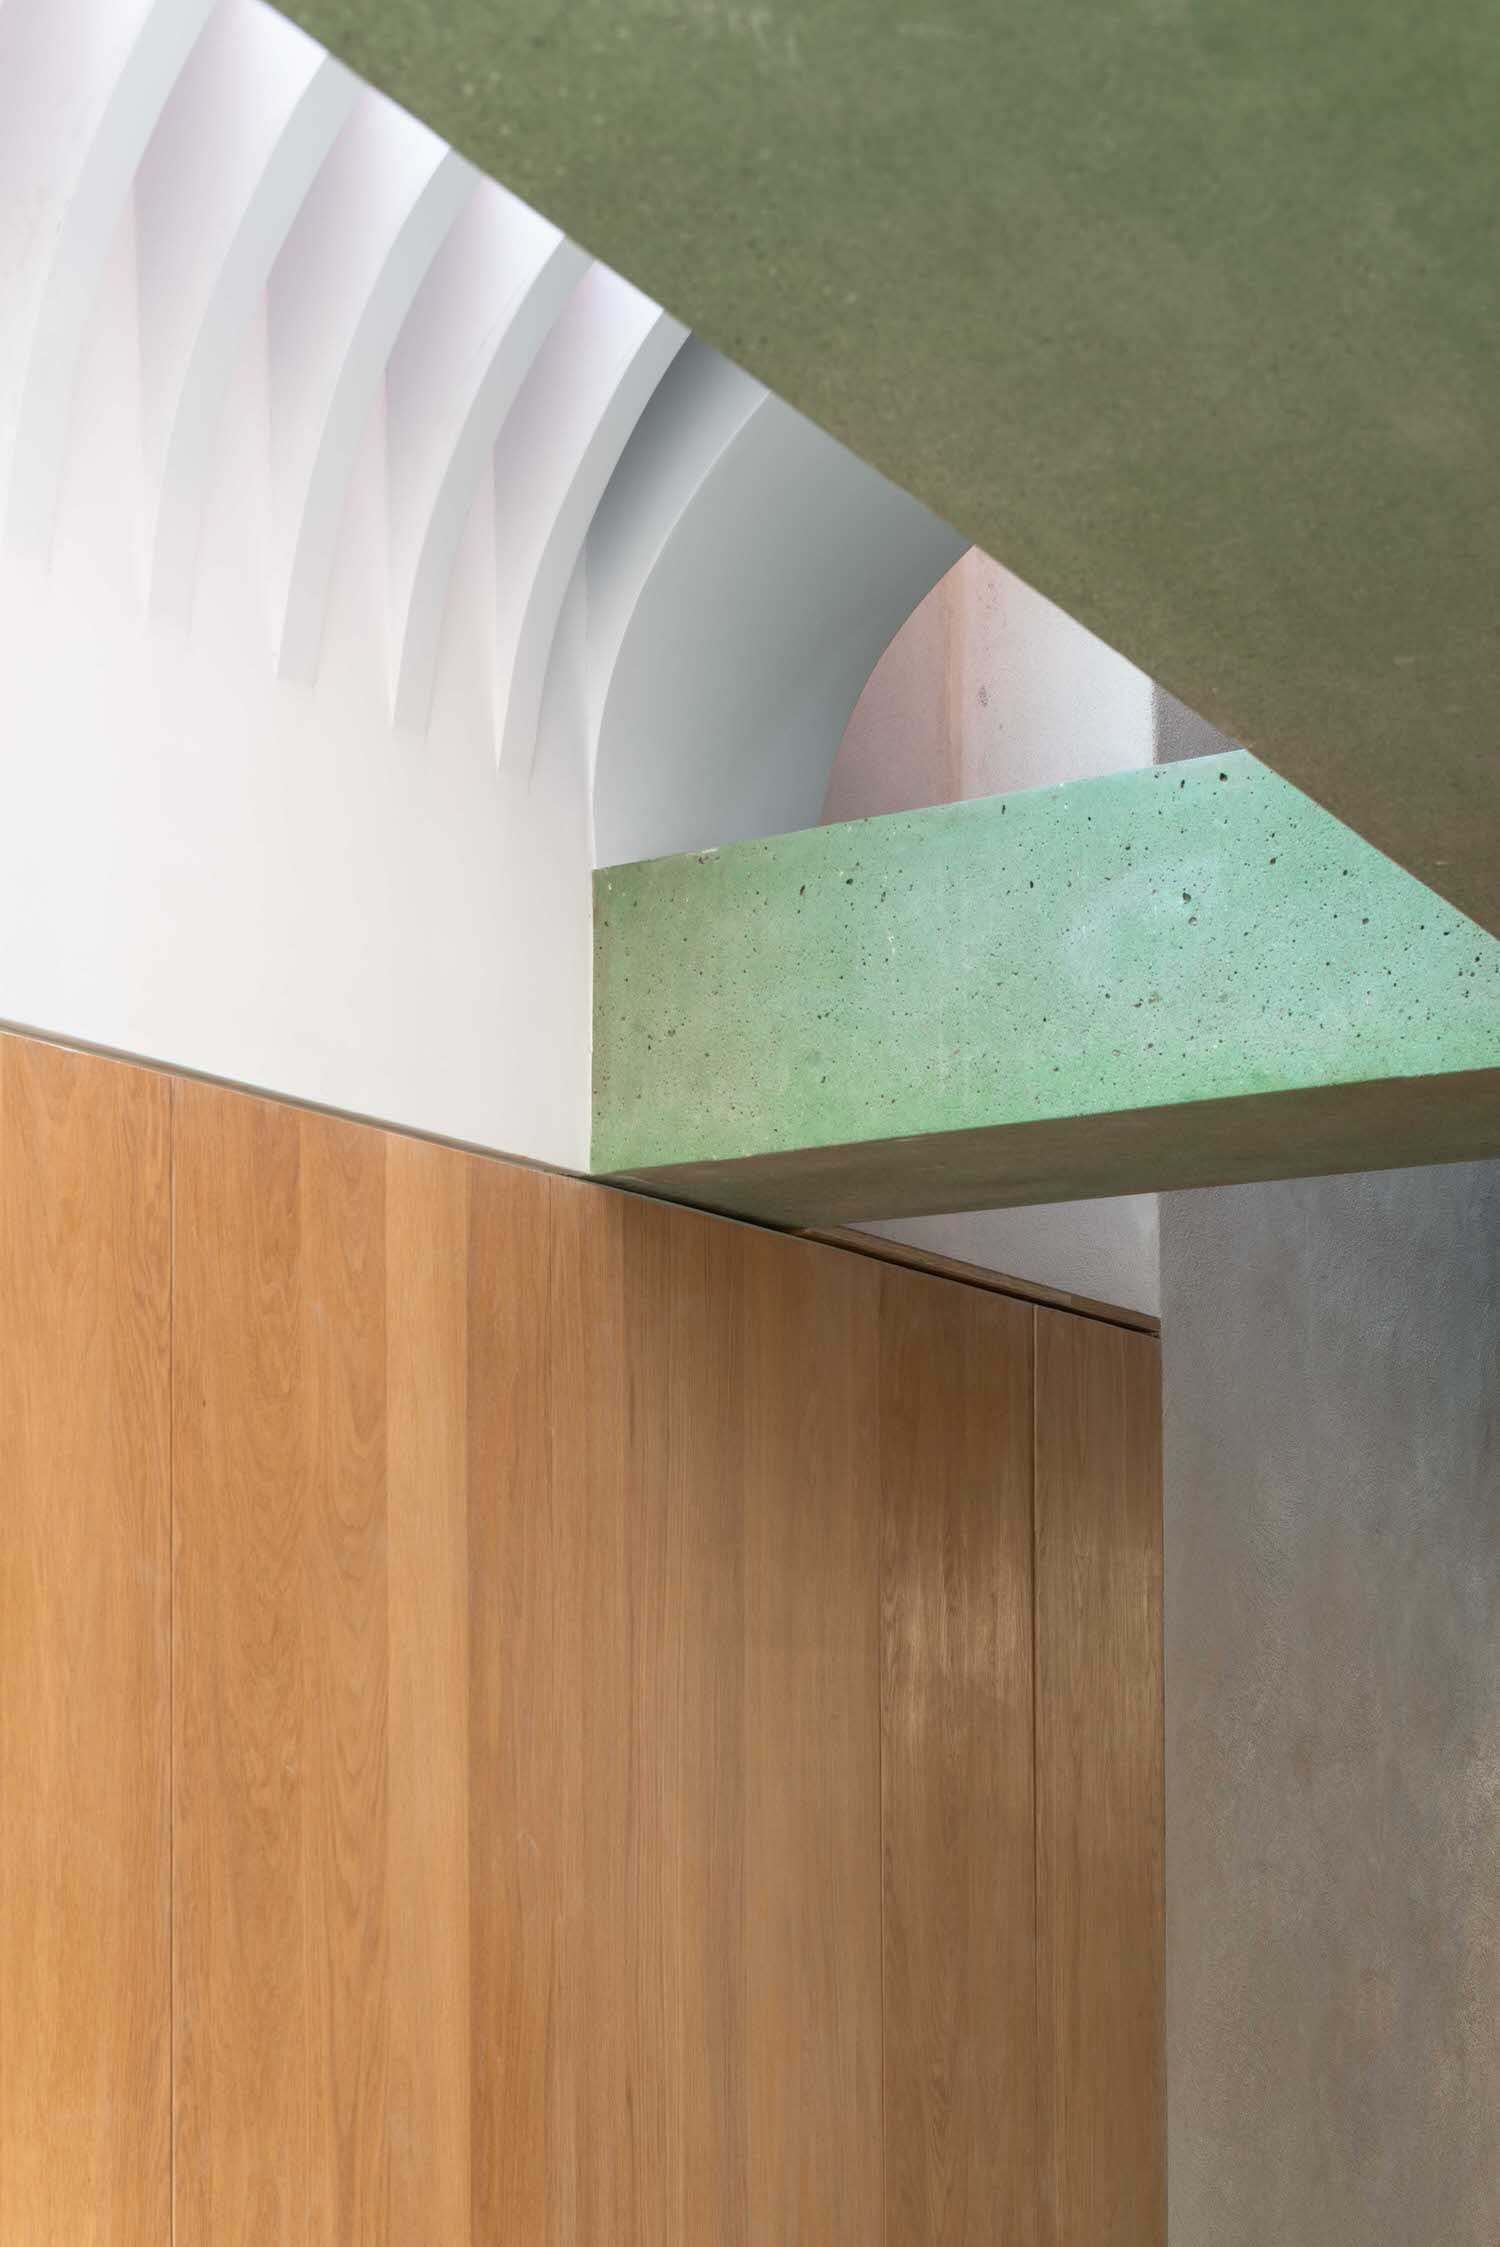 Studio Ben Allen House Recast London Residential Architecture Photo French+tye Yellowtrace 07